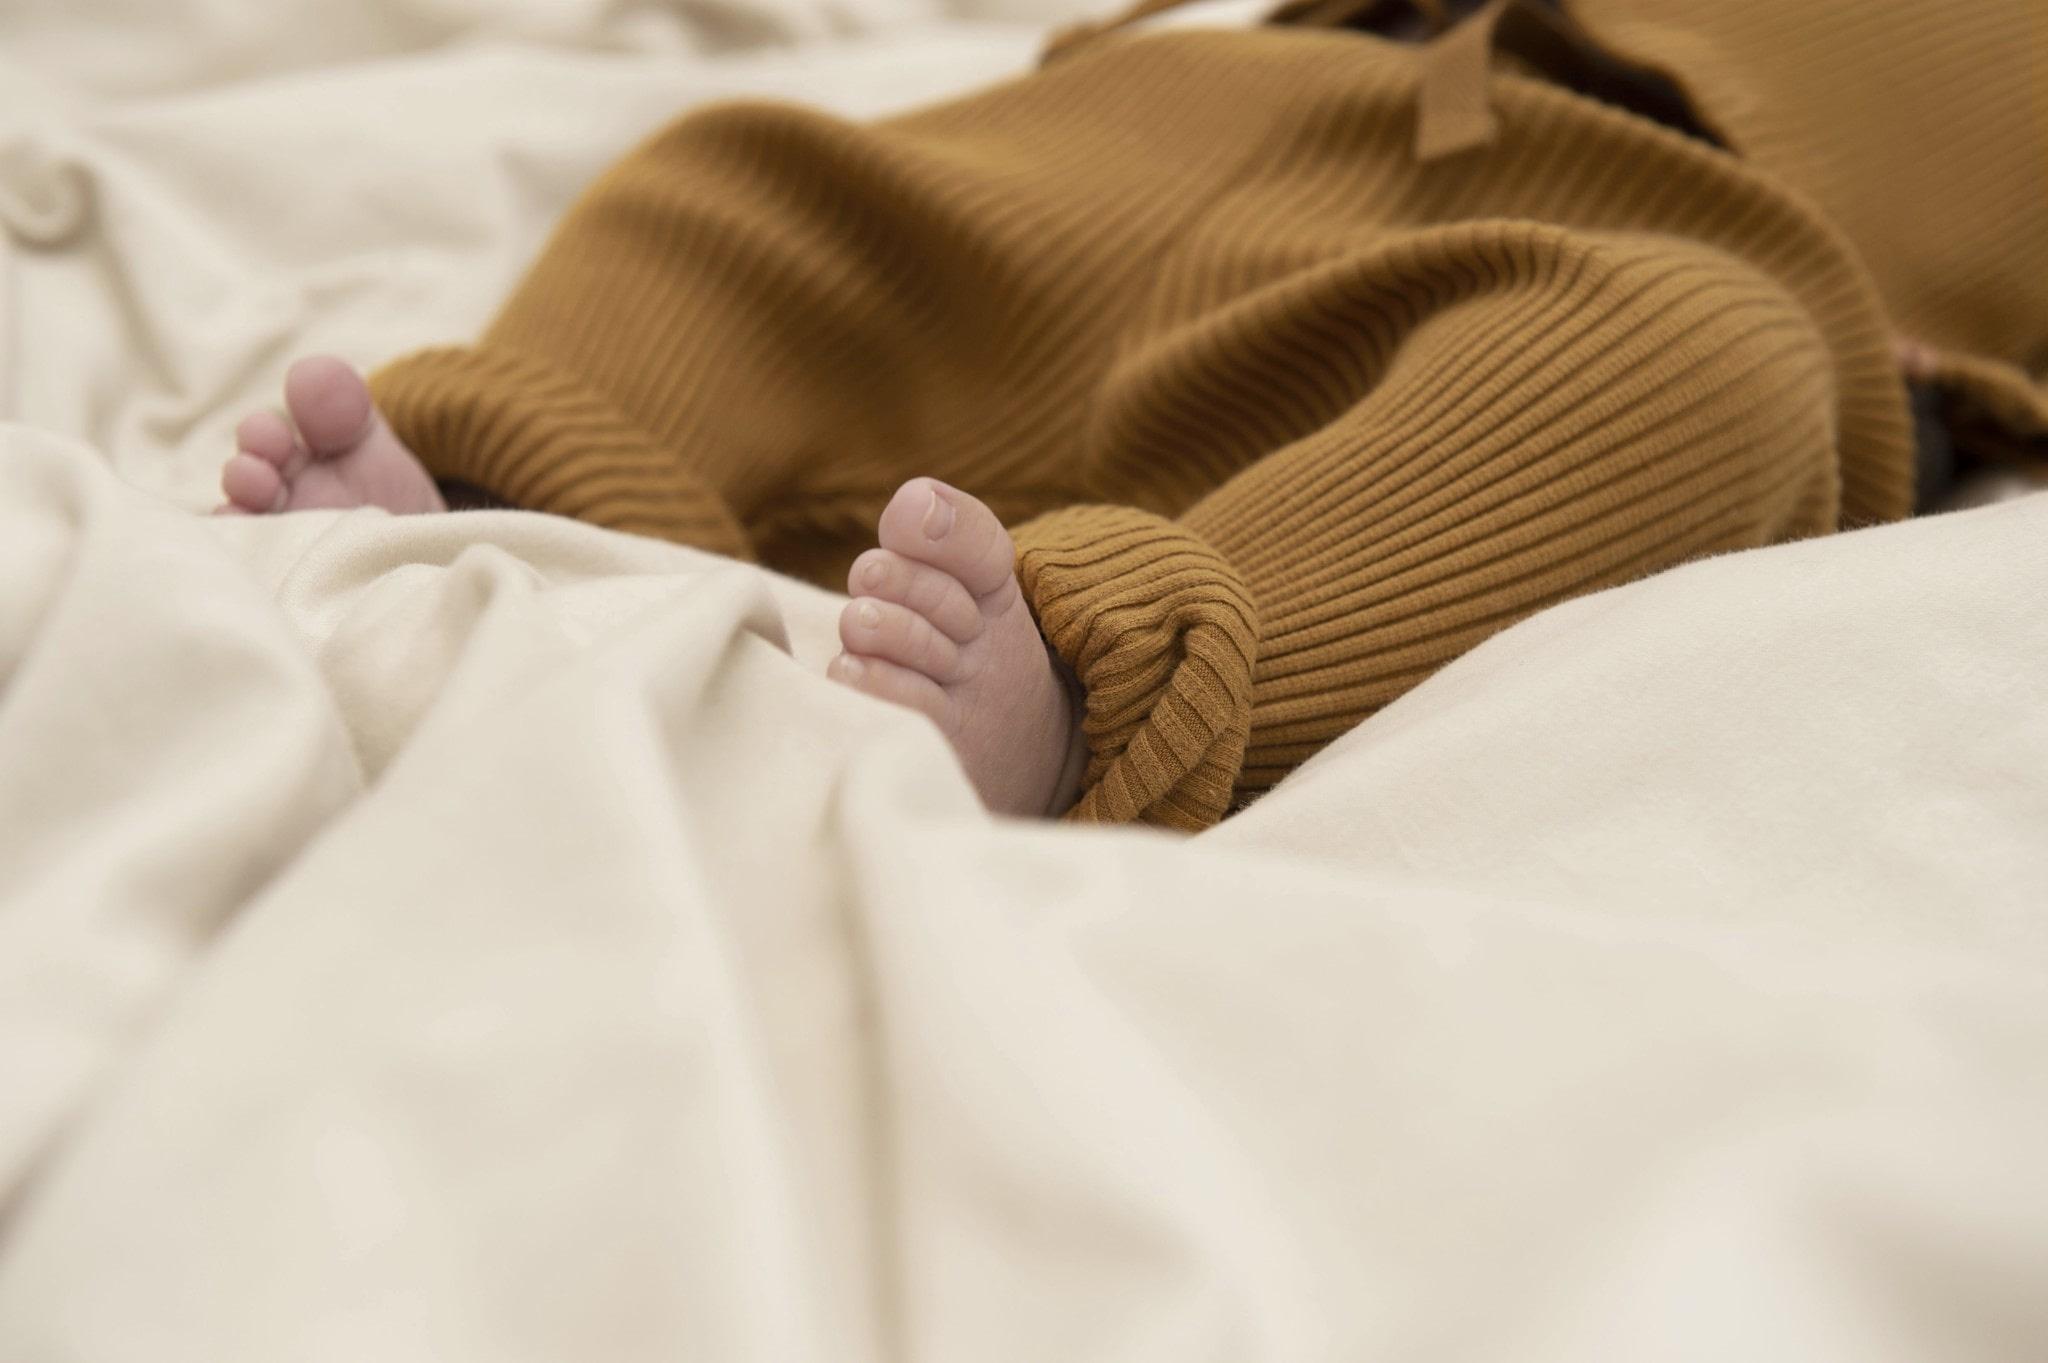 newborn_kleding